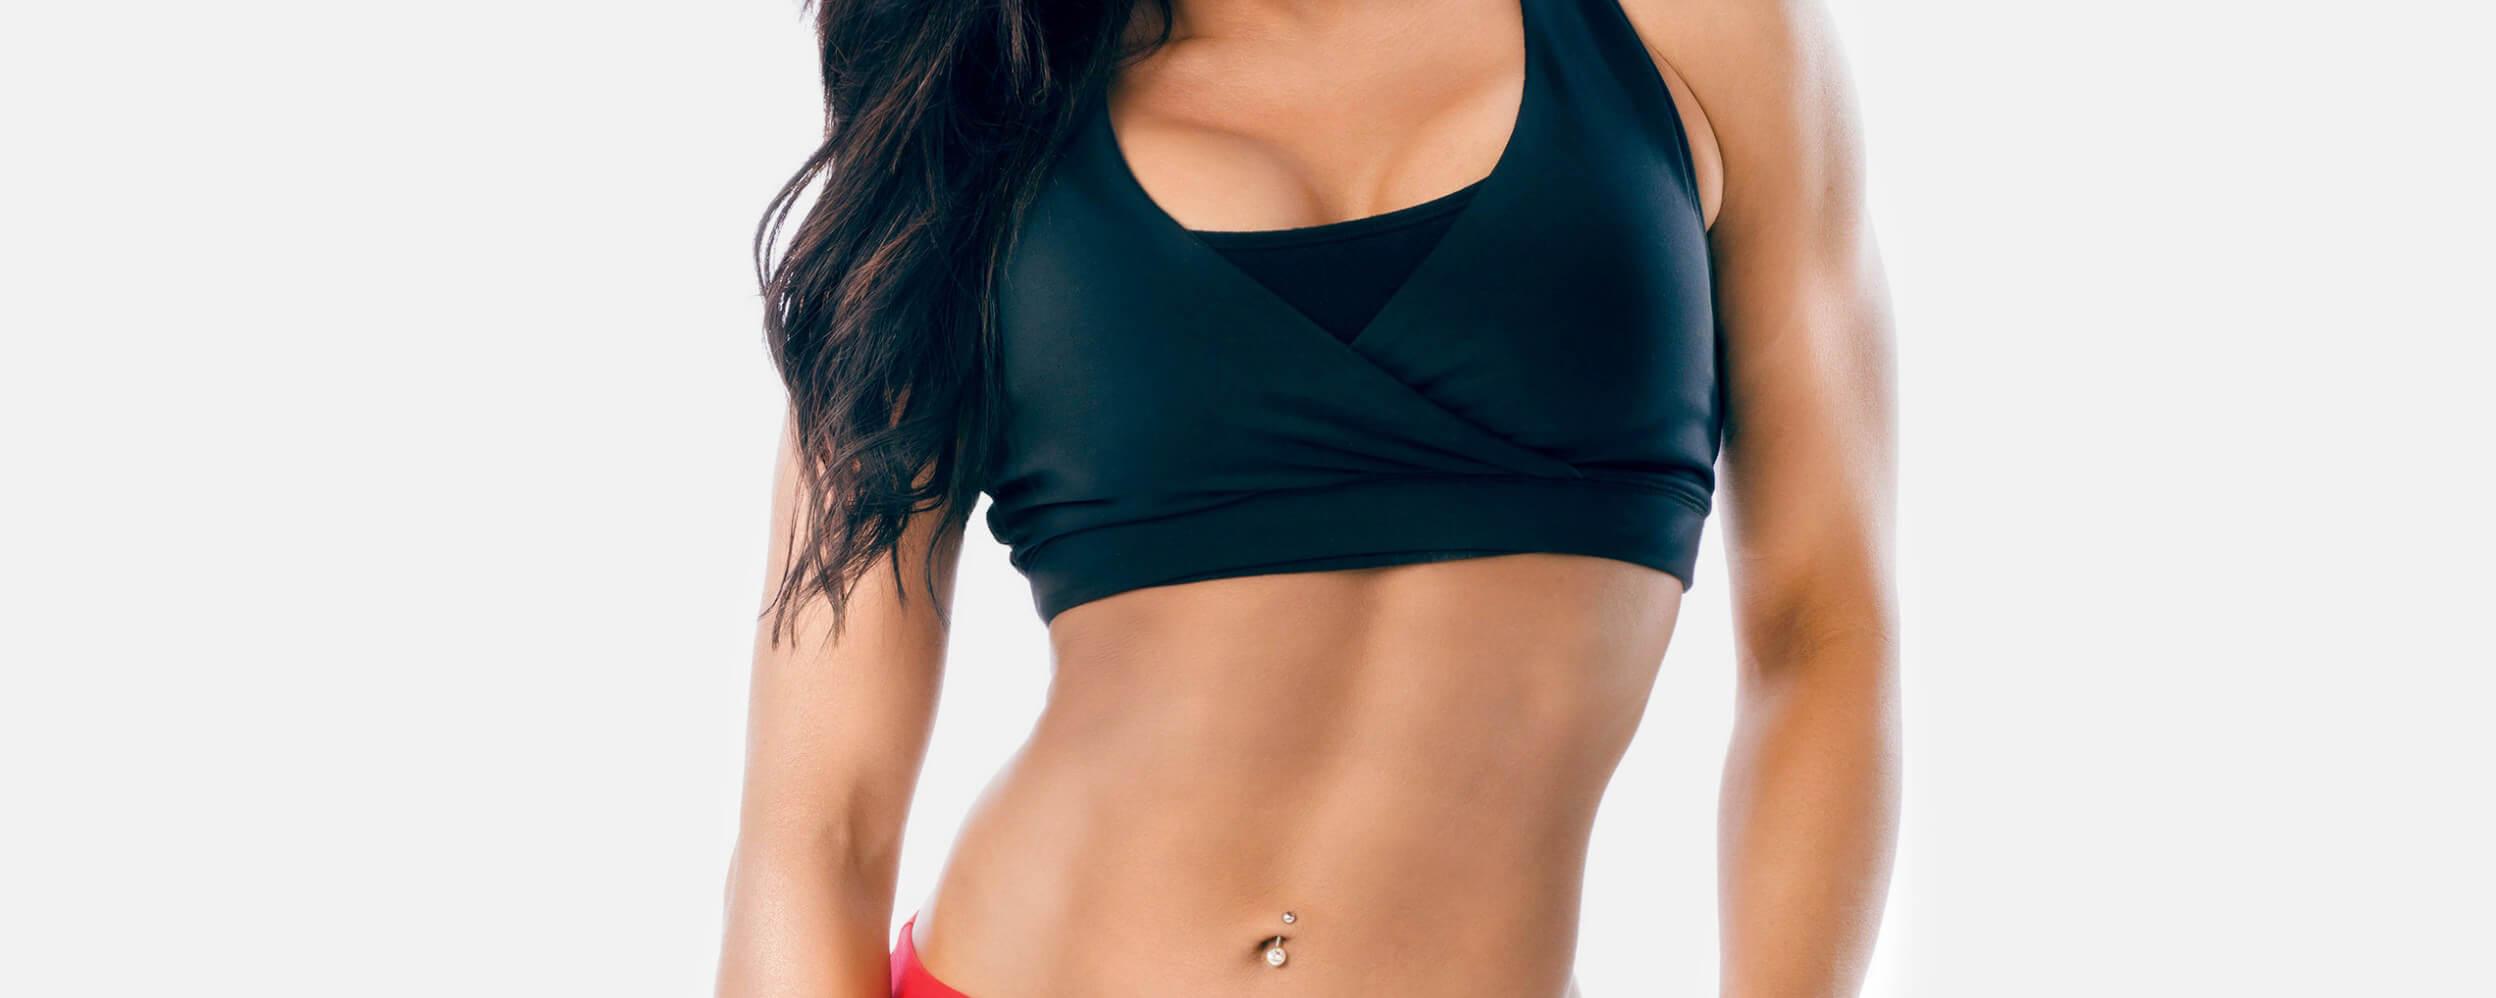 fitness dvd study